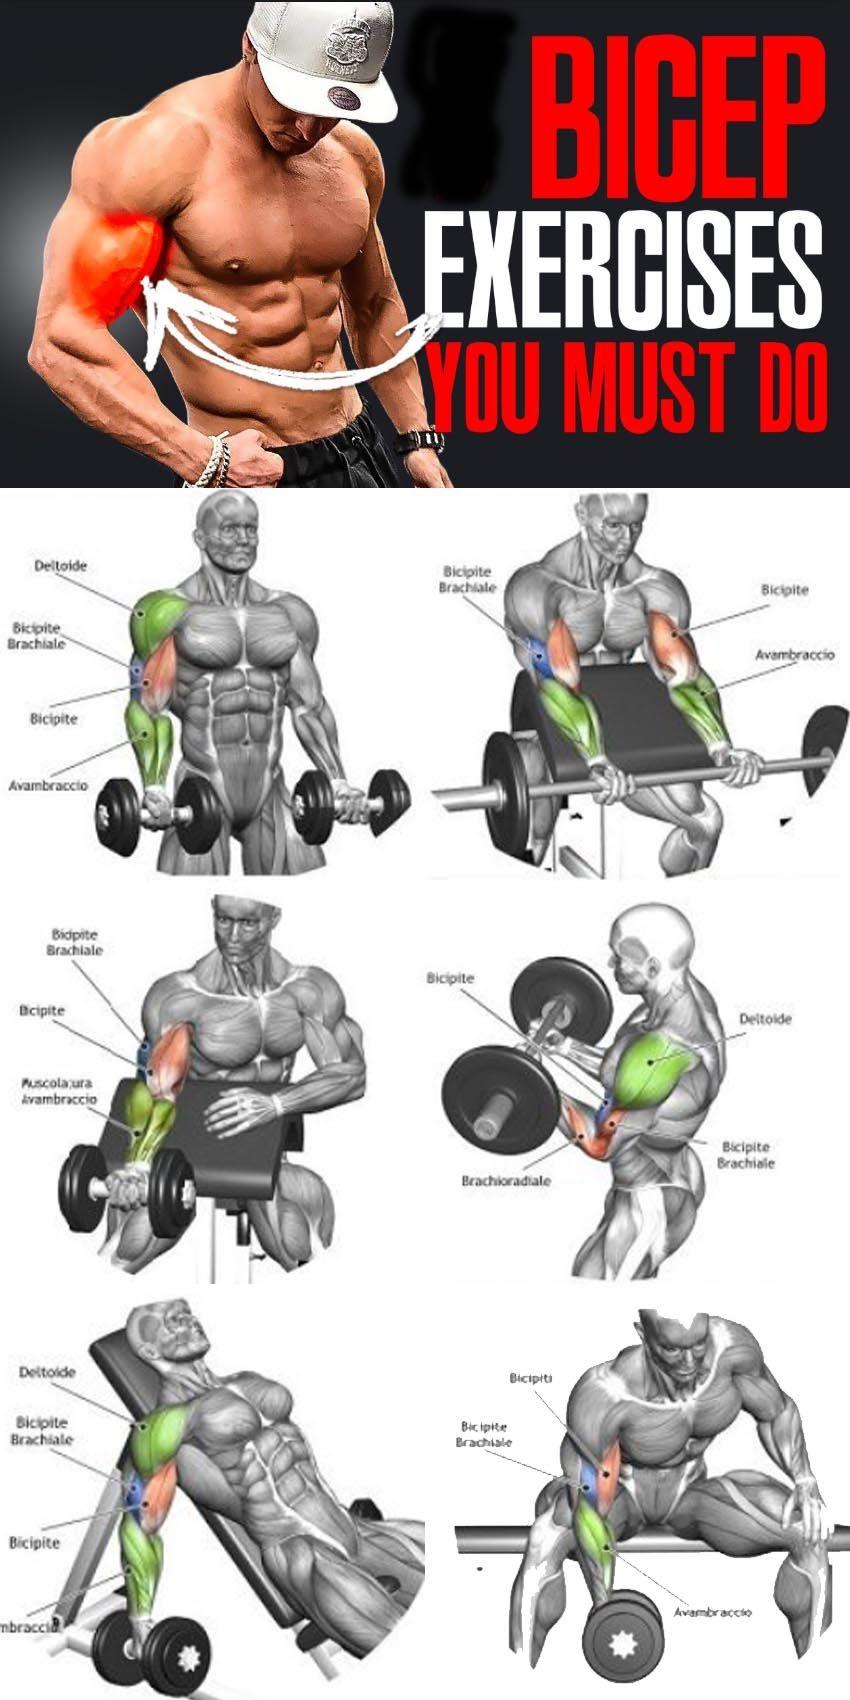 ejercicios pesas biceps